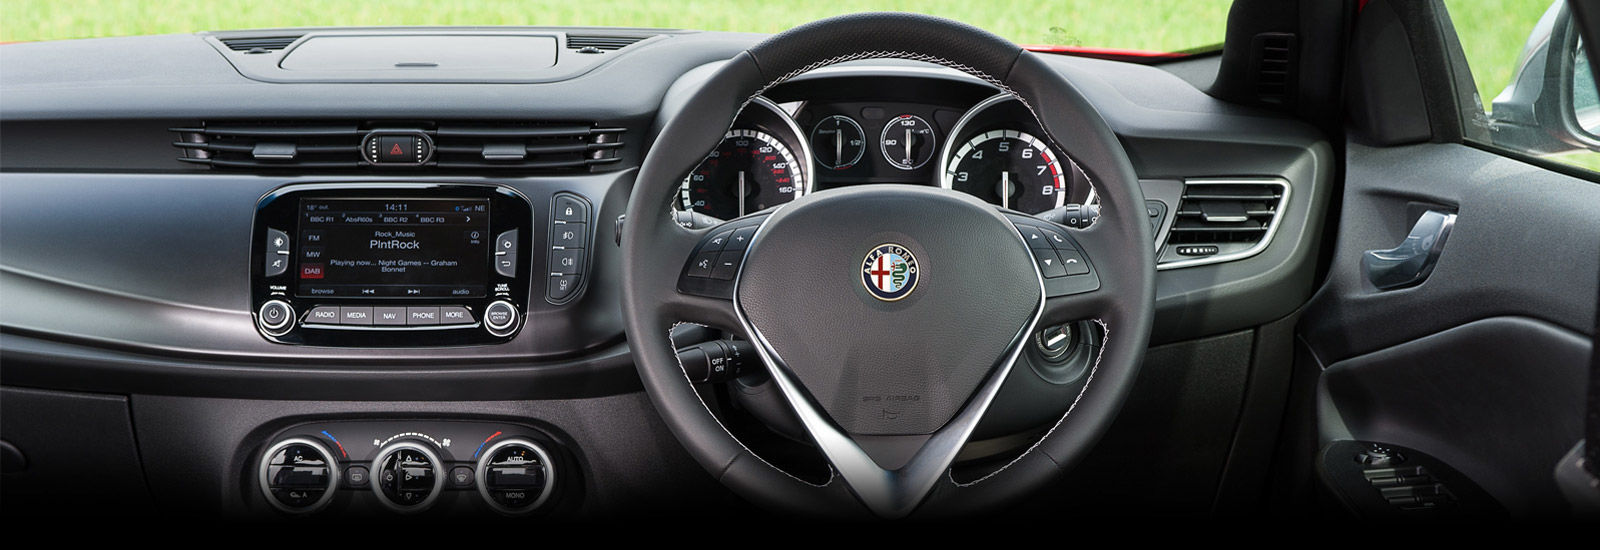 alfa romeo giulietta facelift old vs new carwow. Black Bedroom Furniture Sets. Home Design Ideas